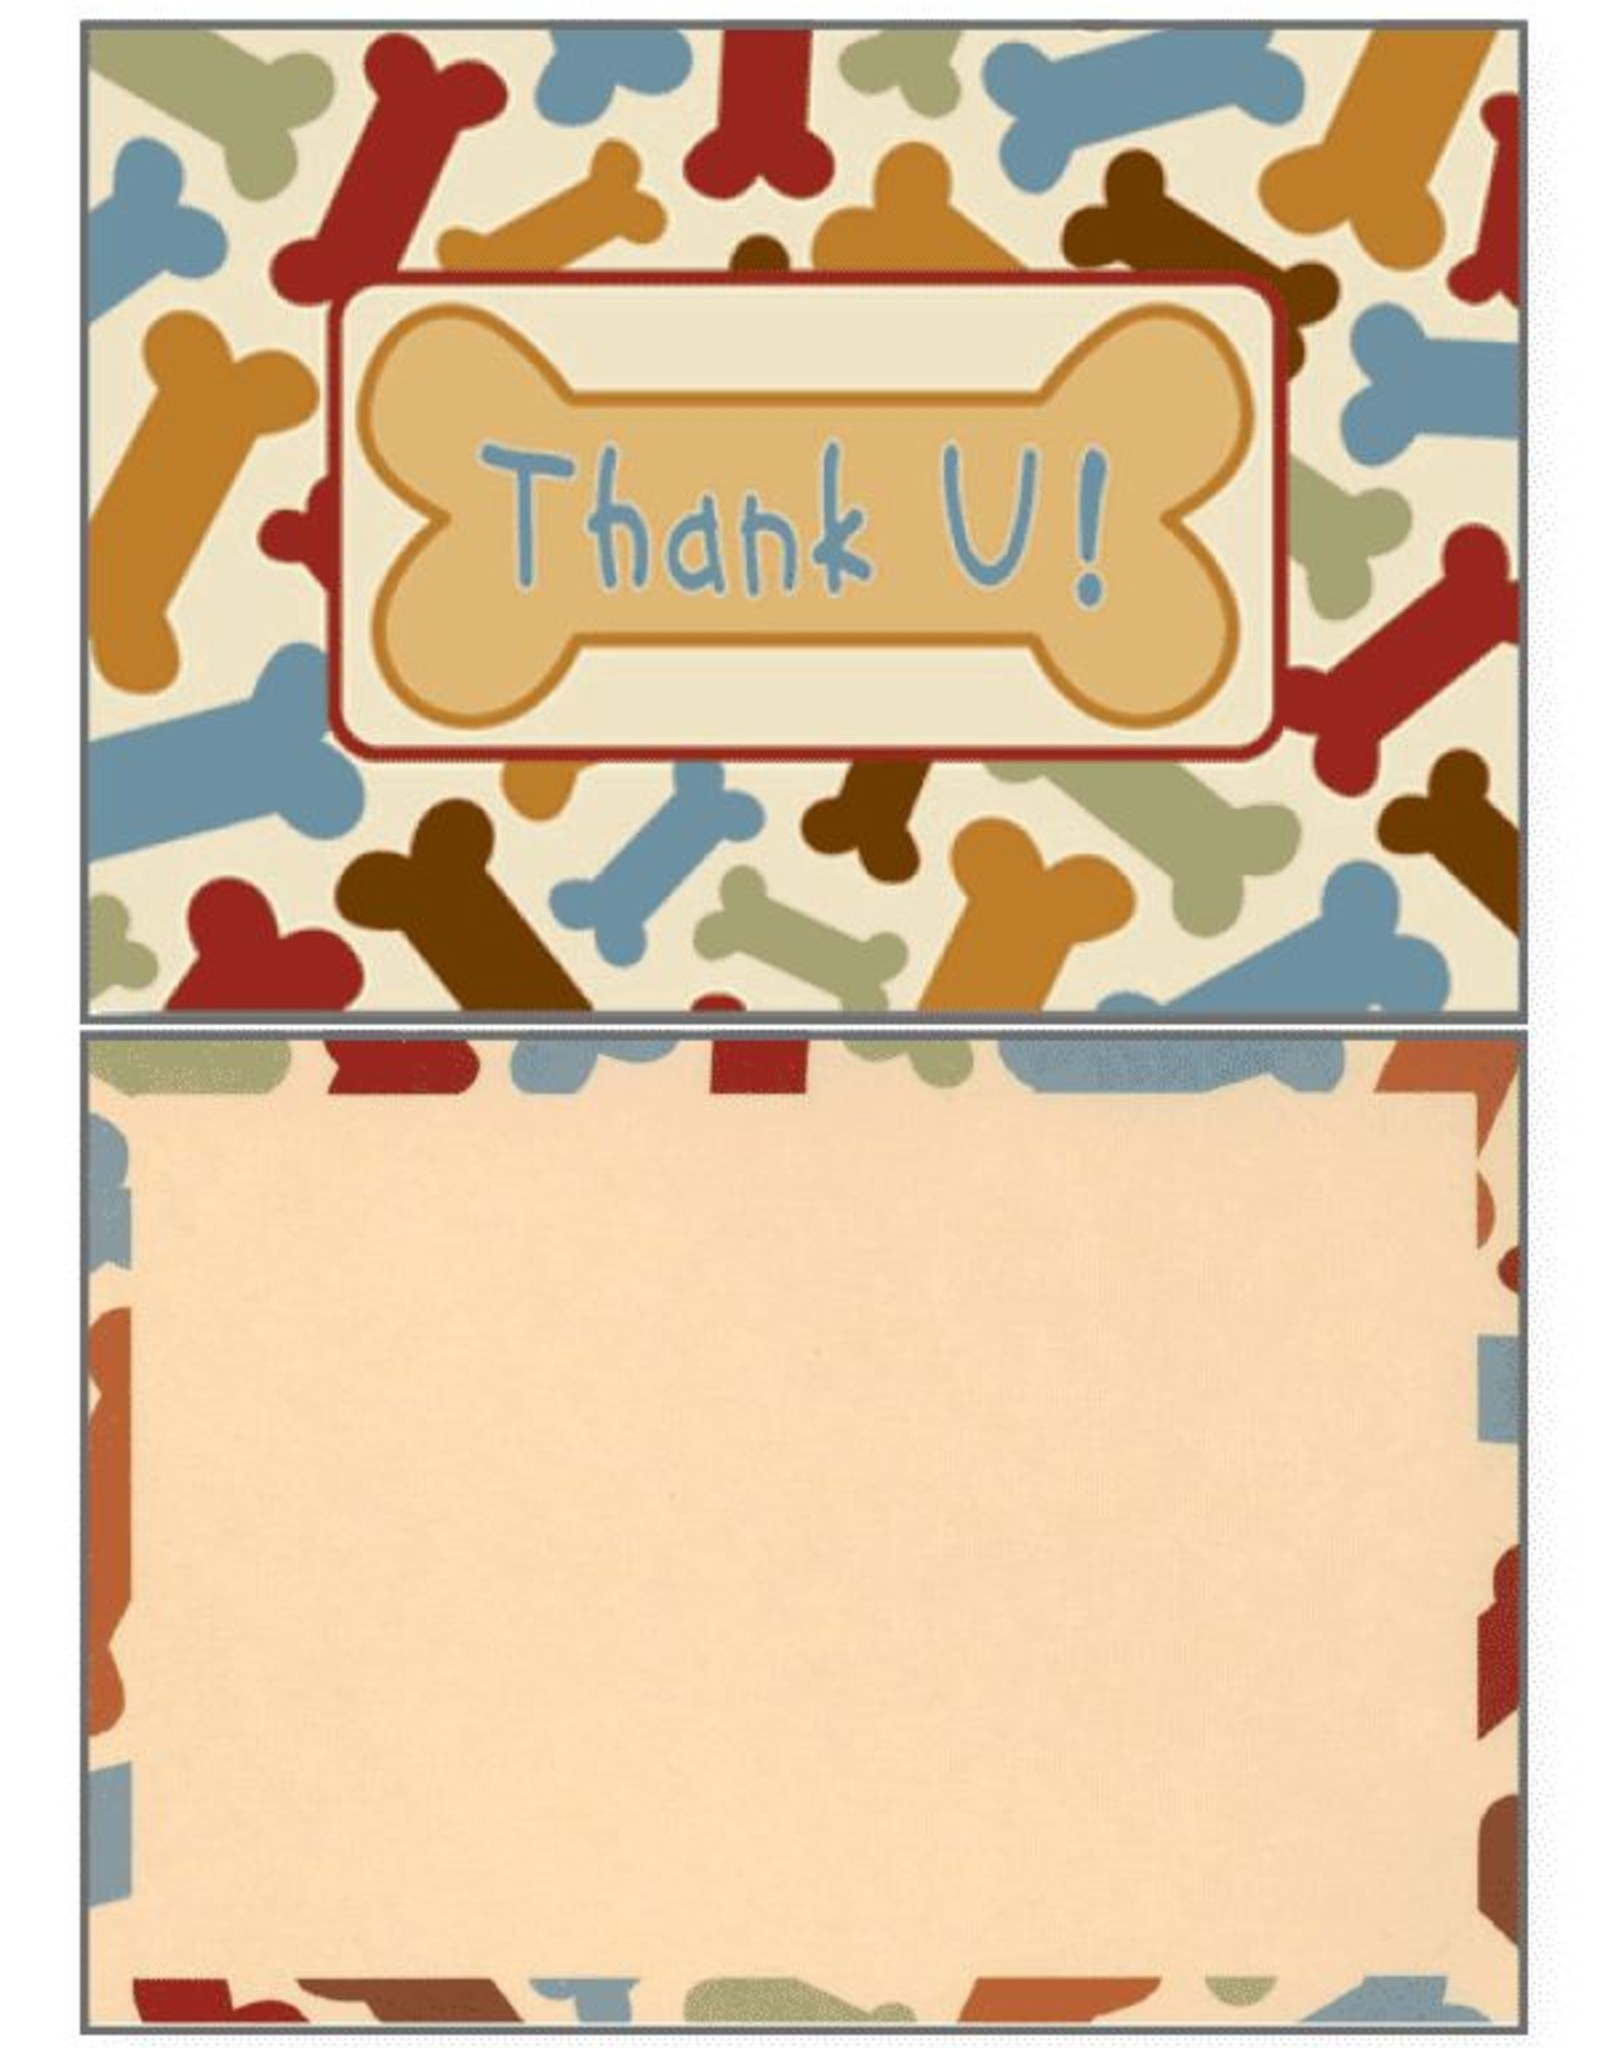 Dog Speak Dog Speak Card - Blank - Thank You